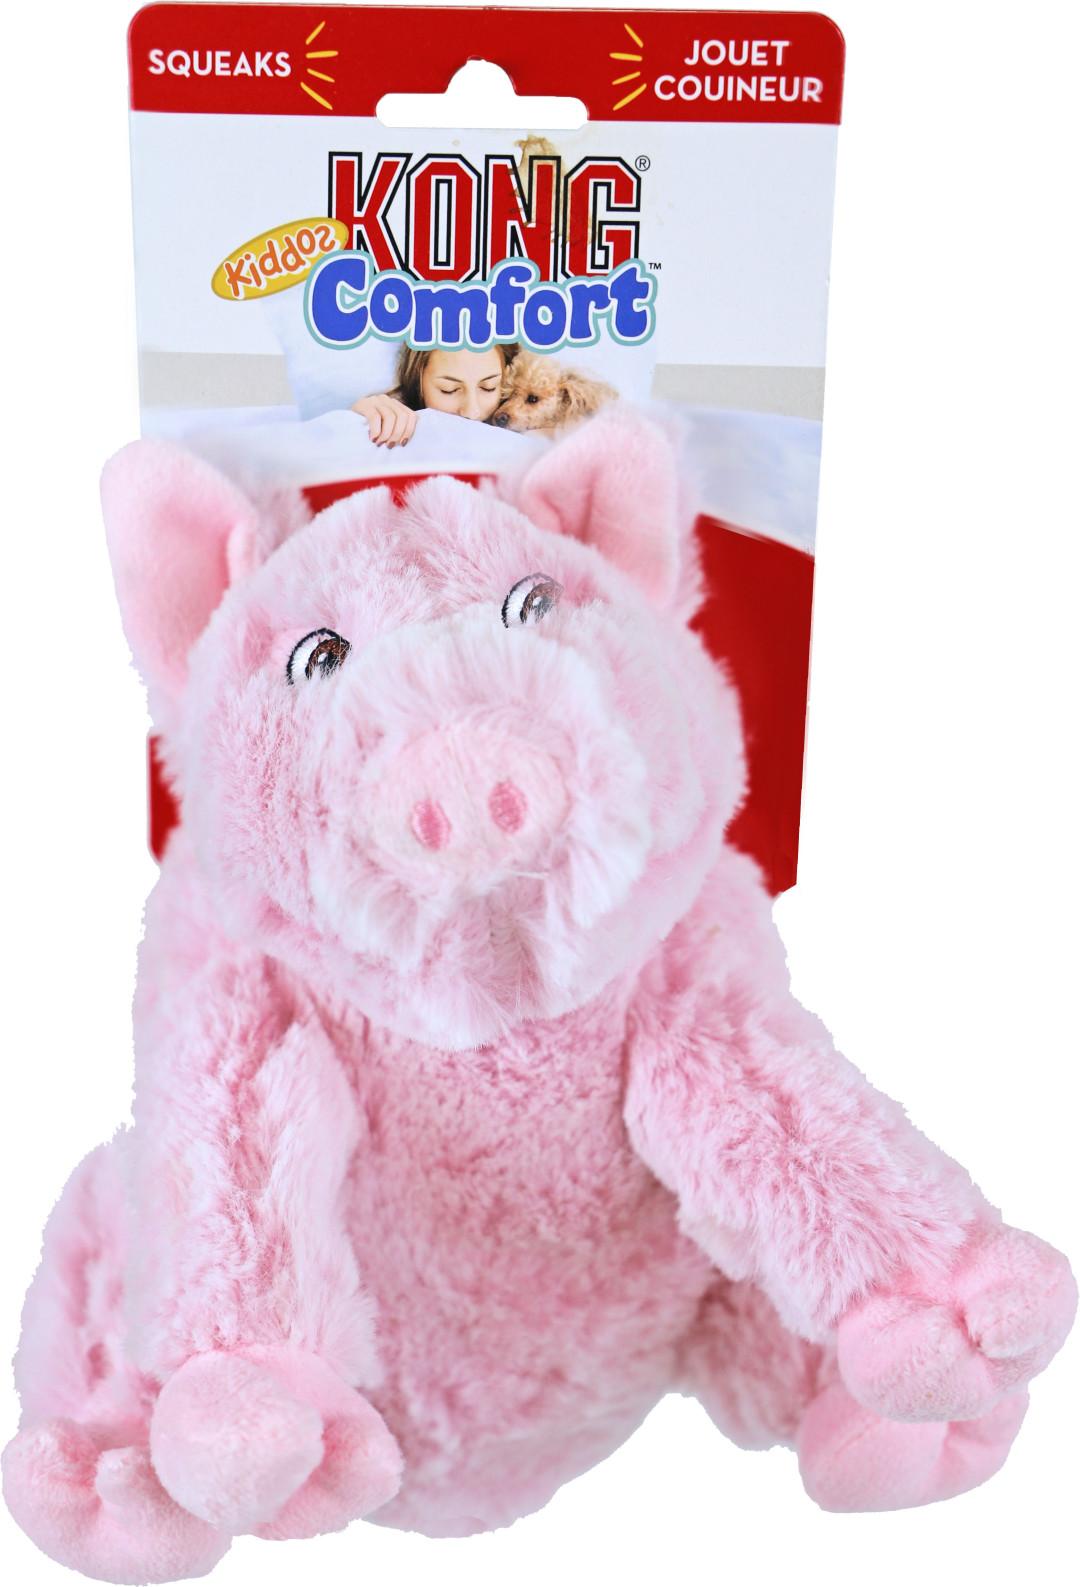 Kong Comfort Kiddos varken S